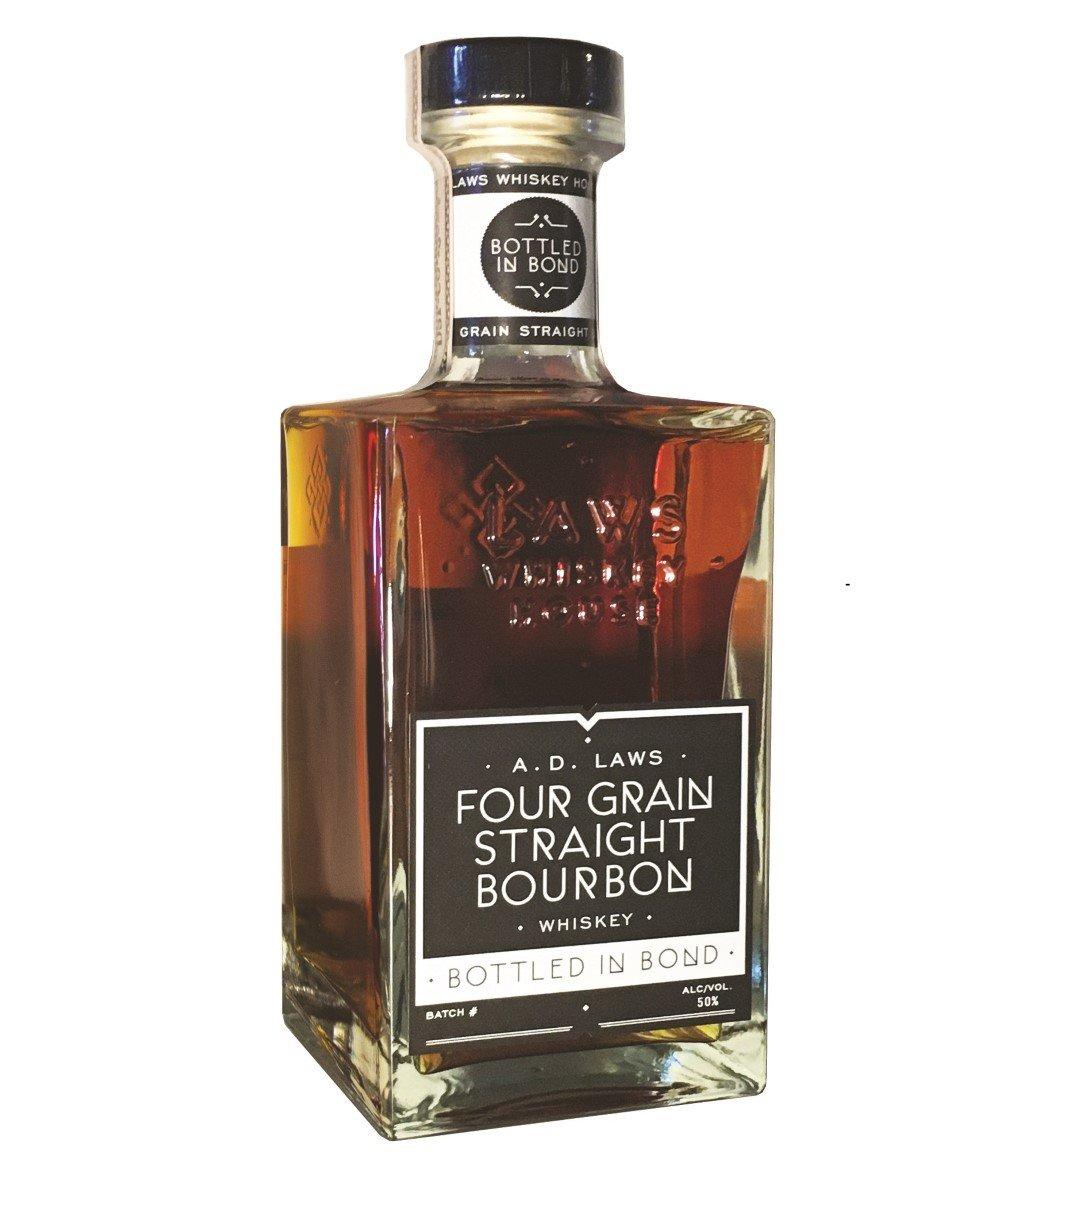 A.D. Laws Four Grain Straight Bourbon Bottled in Bond